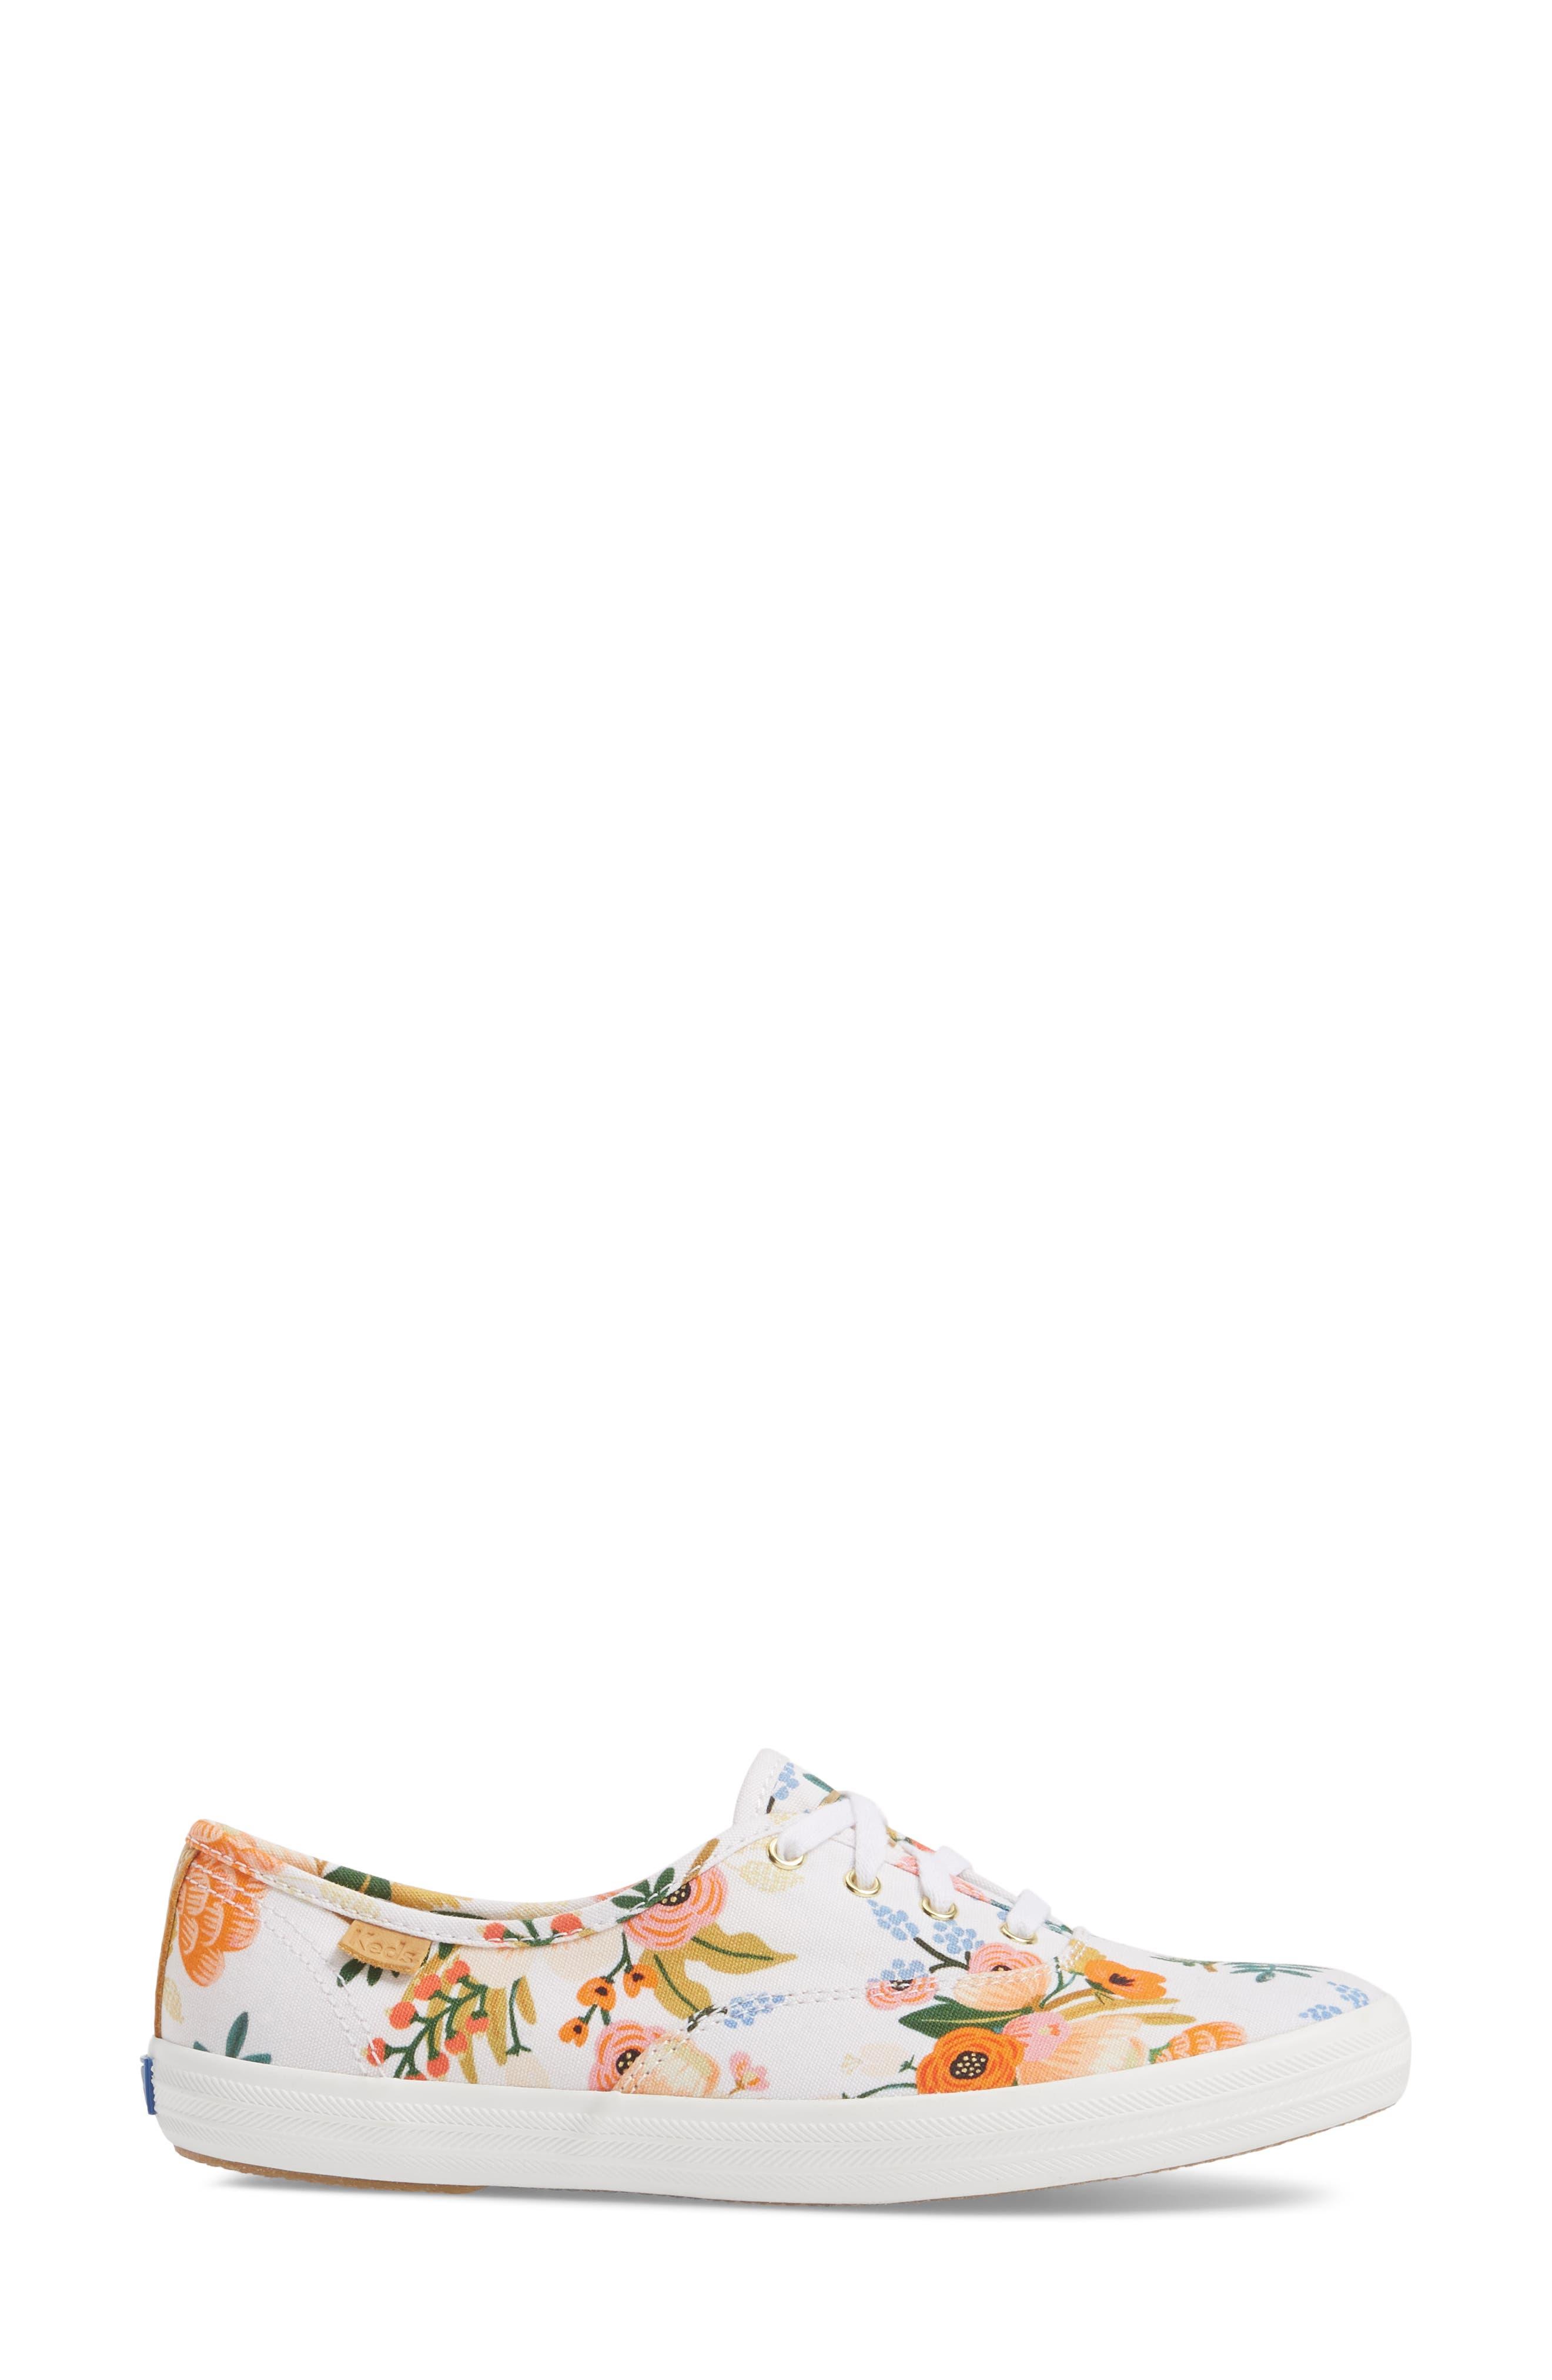 x Rifle Paper Co. Champion Floral Print Sneaker,                             Alternate thumbnail 3, color,                             WHITE